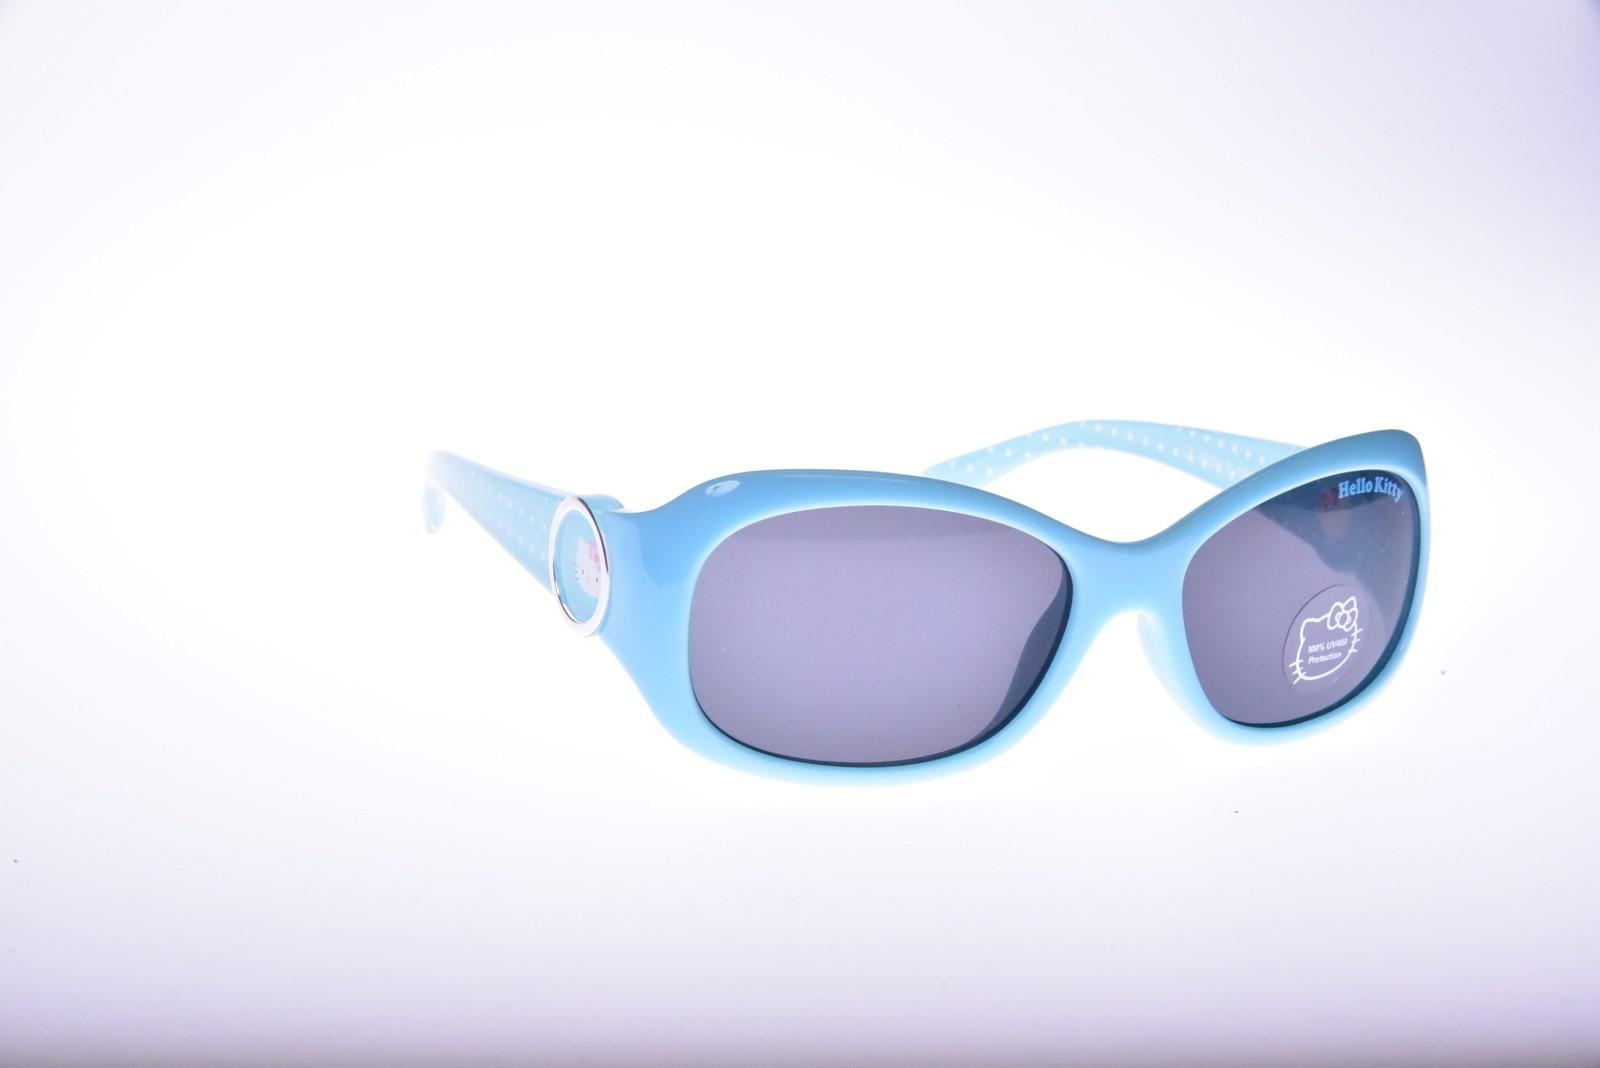 Polaroid Hello Kitty K6201B - Slnečné okuliare pre deti 4-7 r.